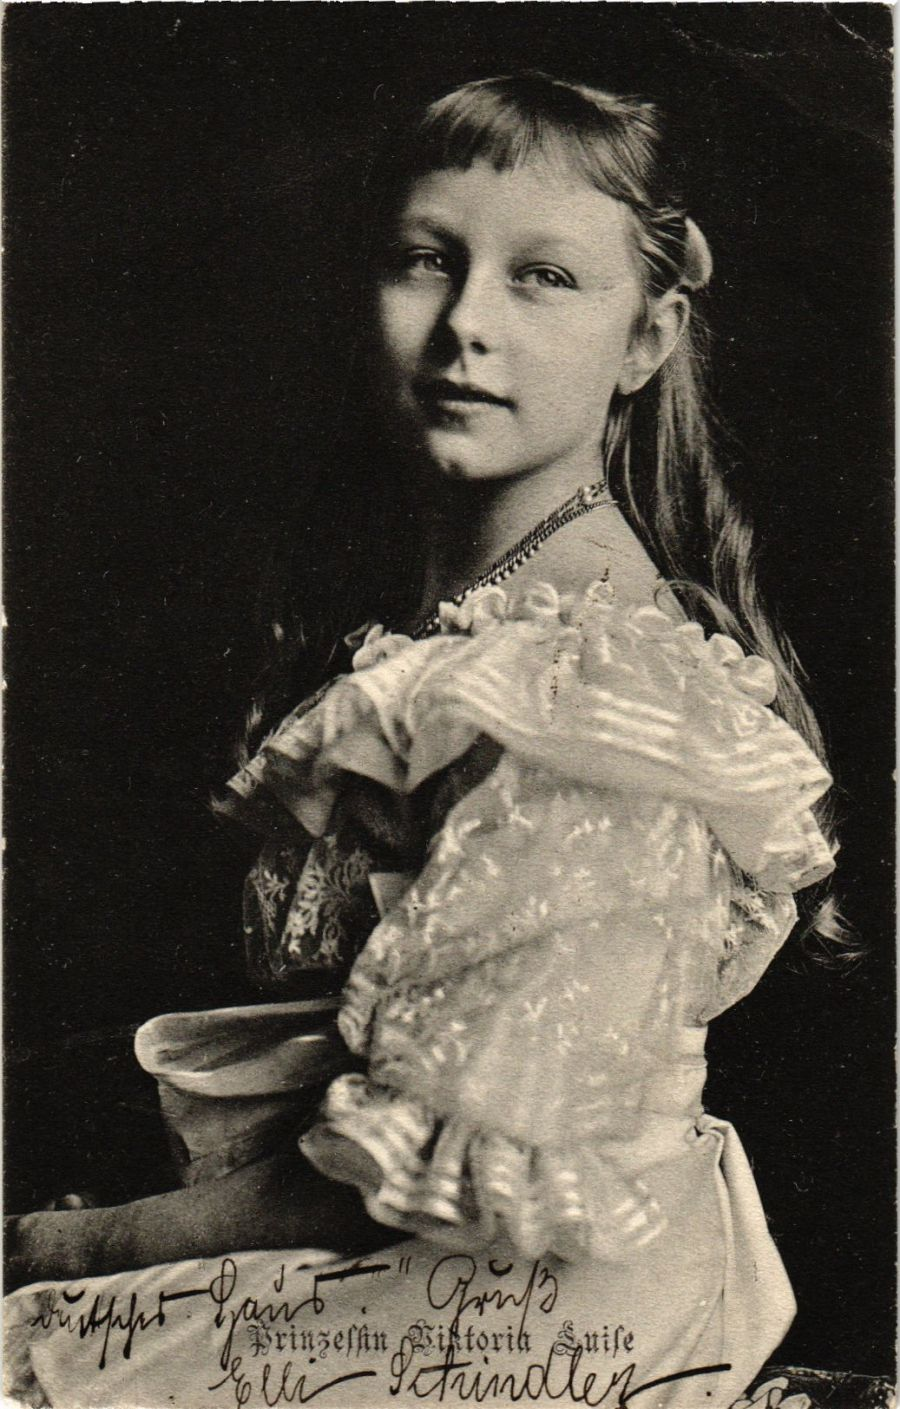 CPA-AK-Prinzessin-Viktoria-Luise-v-Preussen-GERMAN-ROYALTY-867900